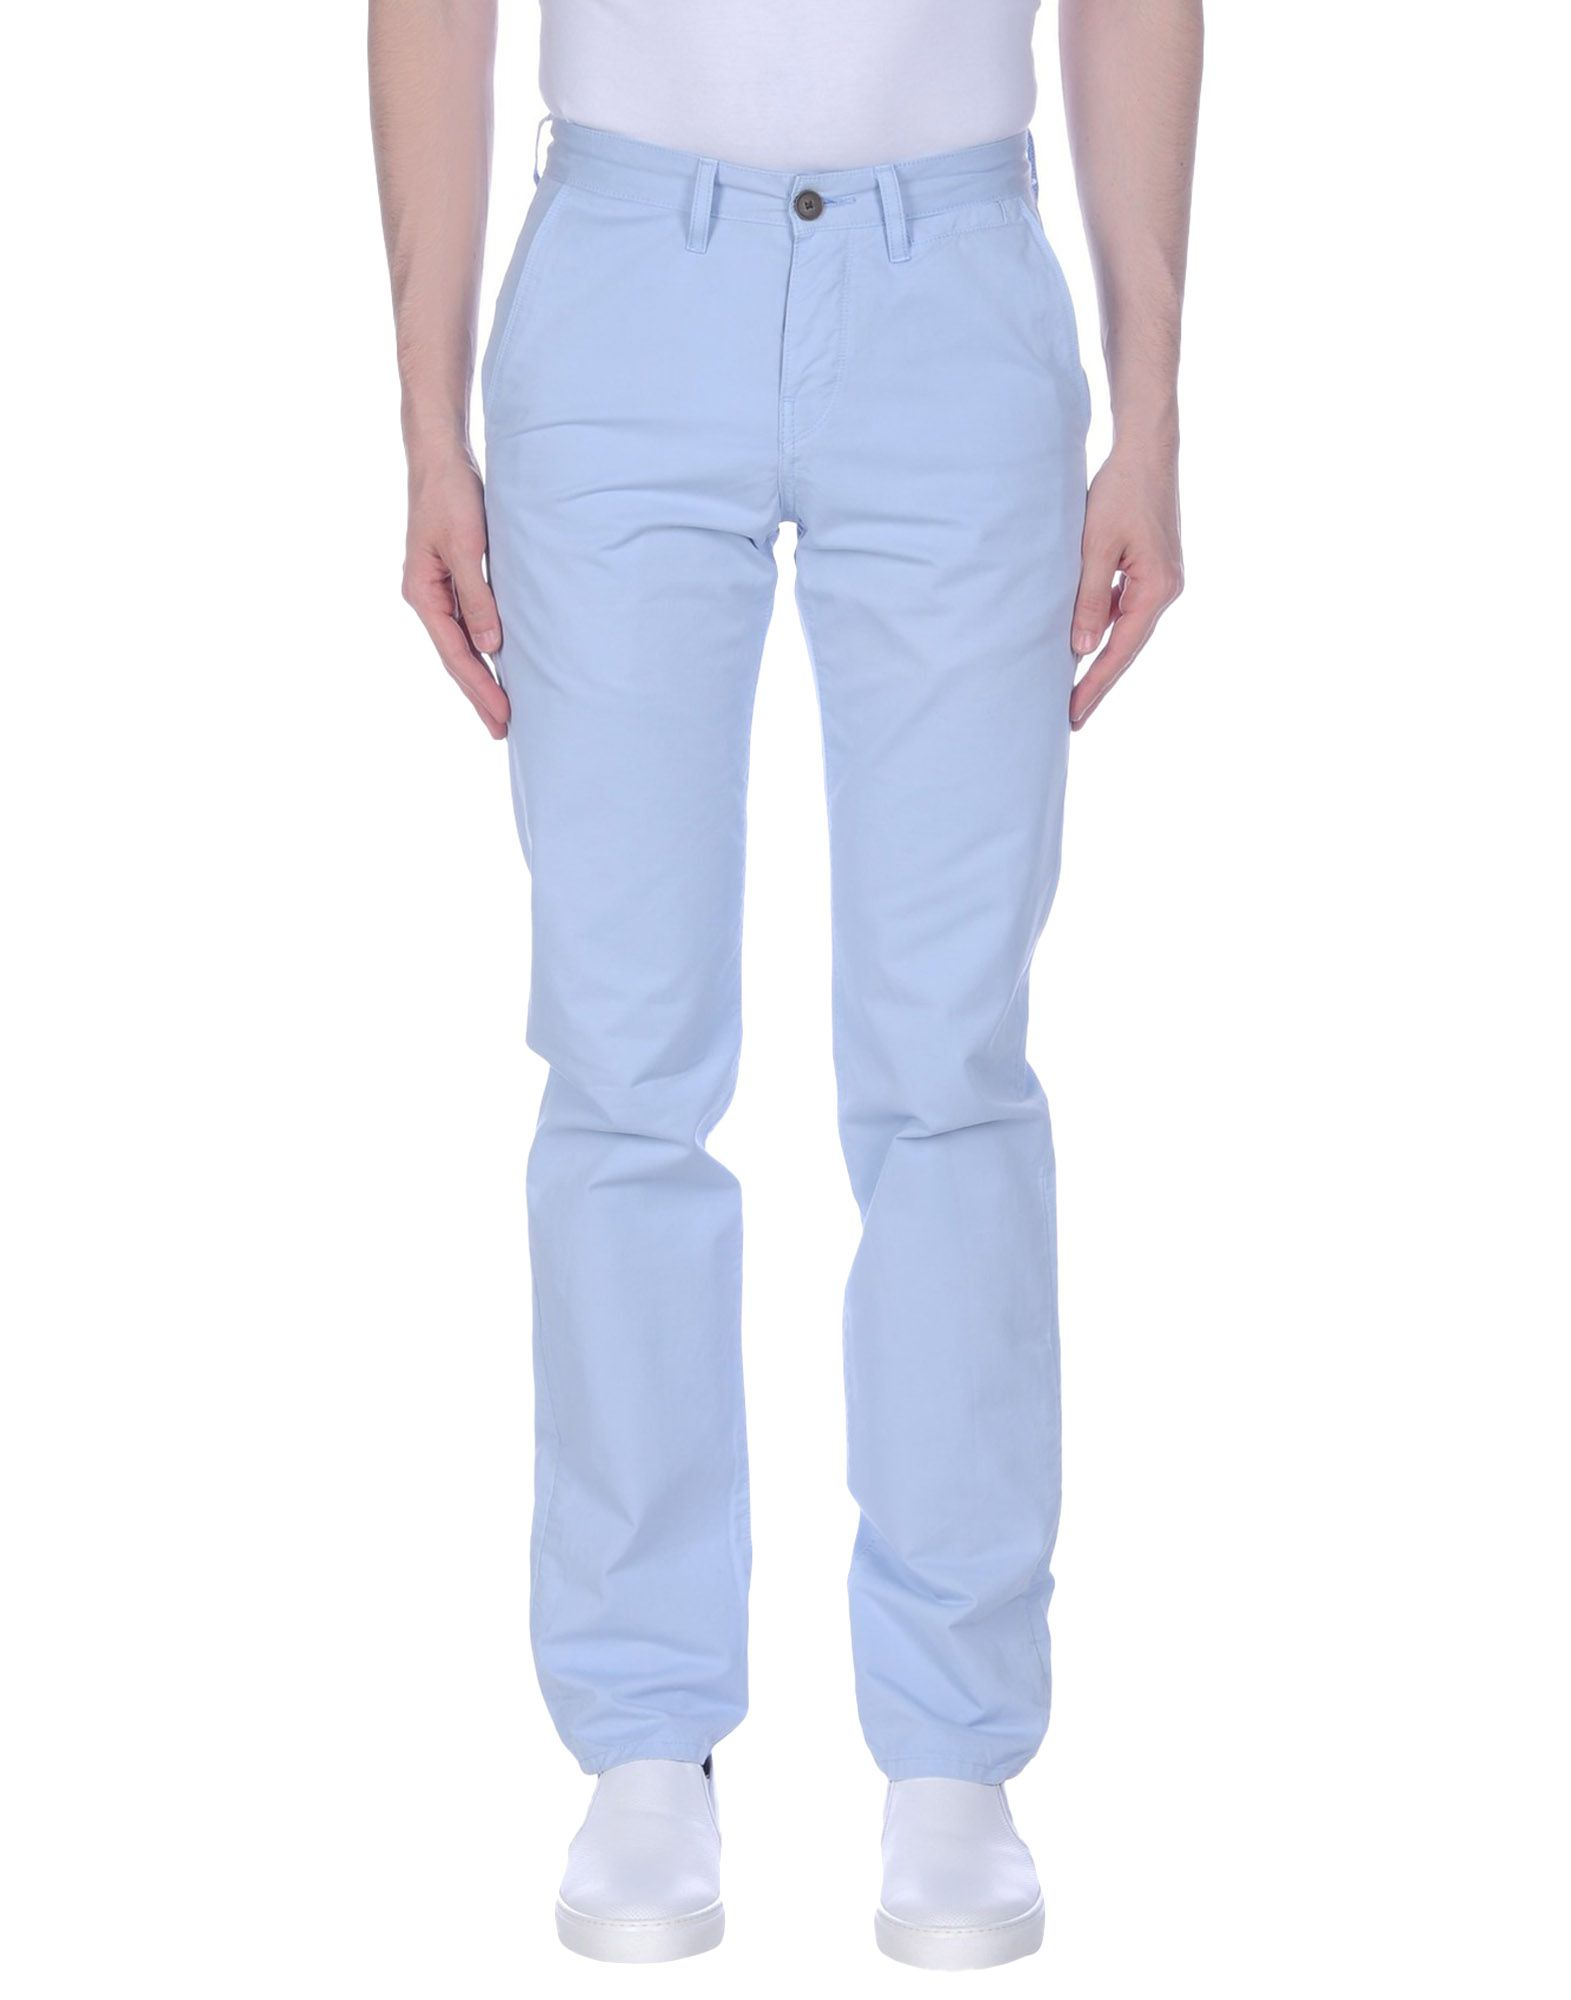 CHINO by BEN SHERMAN Повседневные брюки брюки skills classic chino khaki l